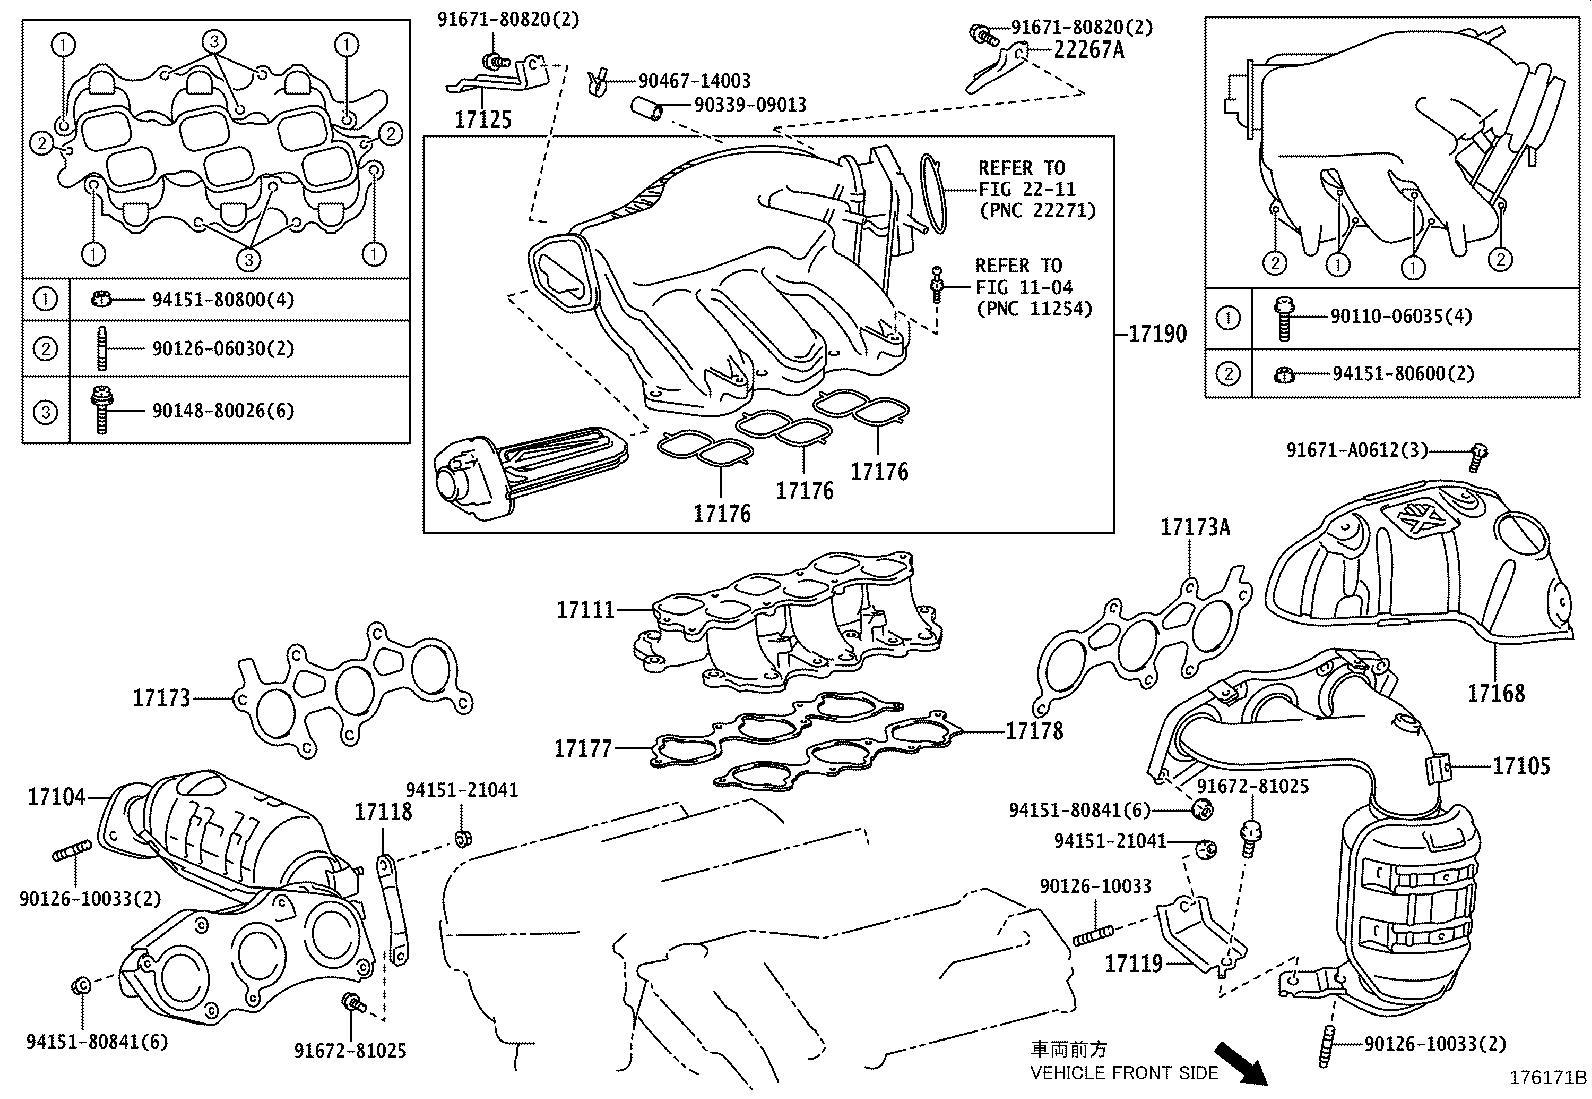 Lexus Rx 350 Exhaust Manifold Gasket Left Gasket